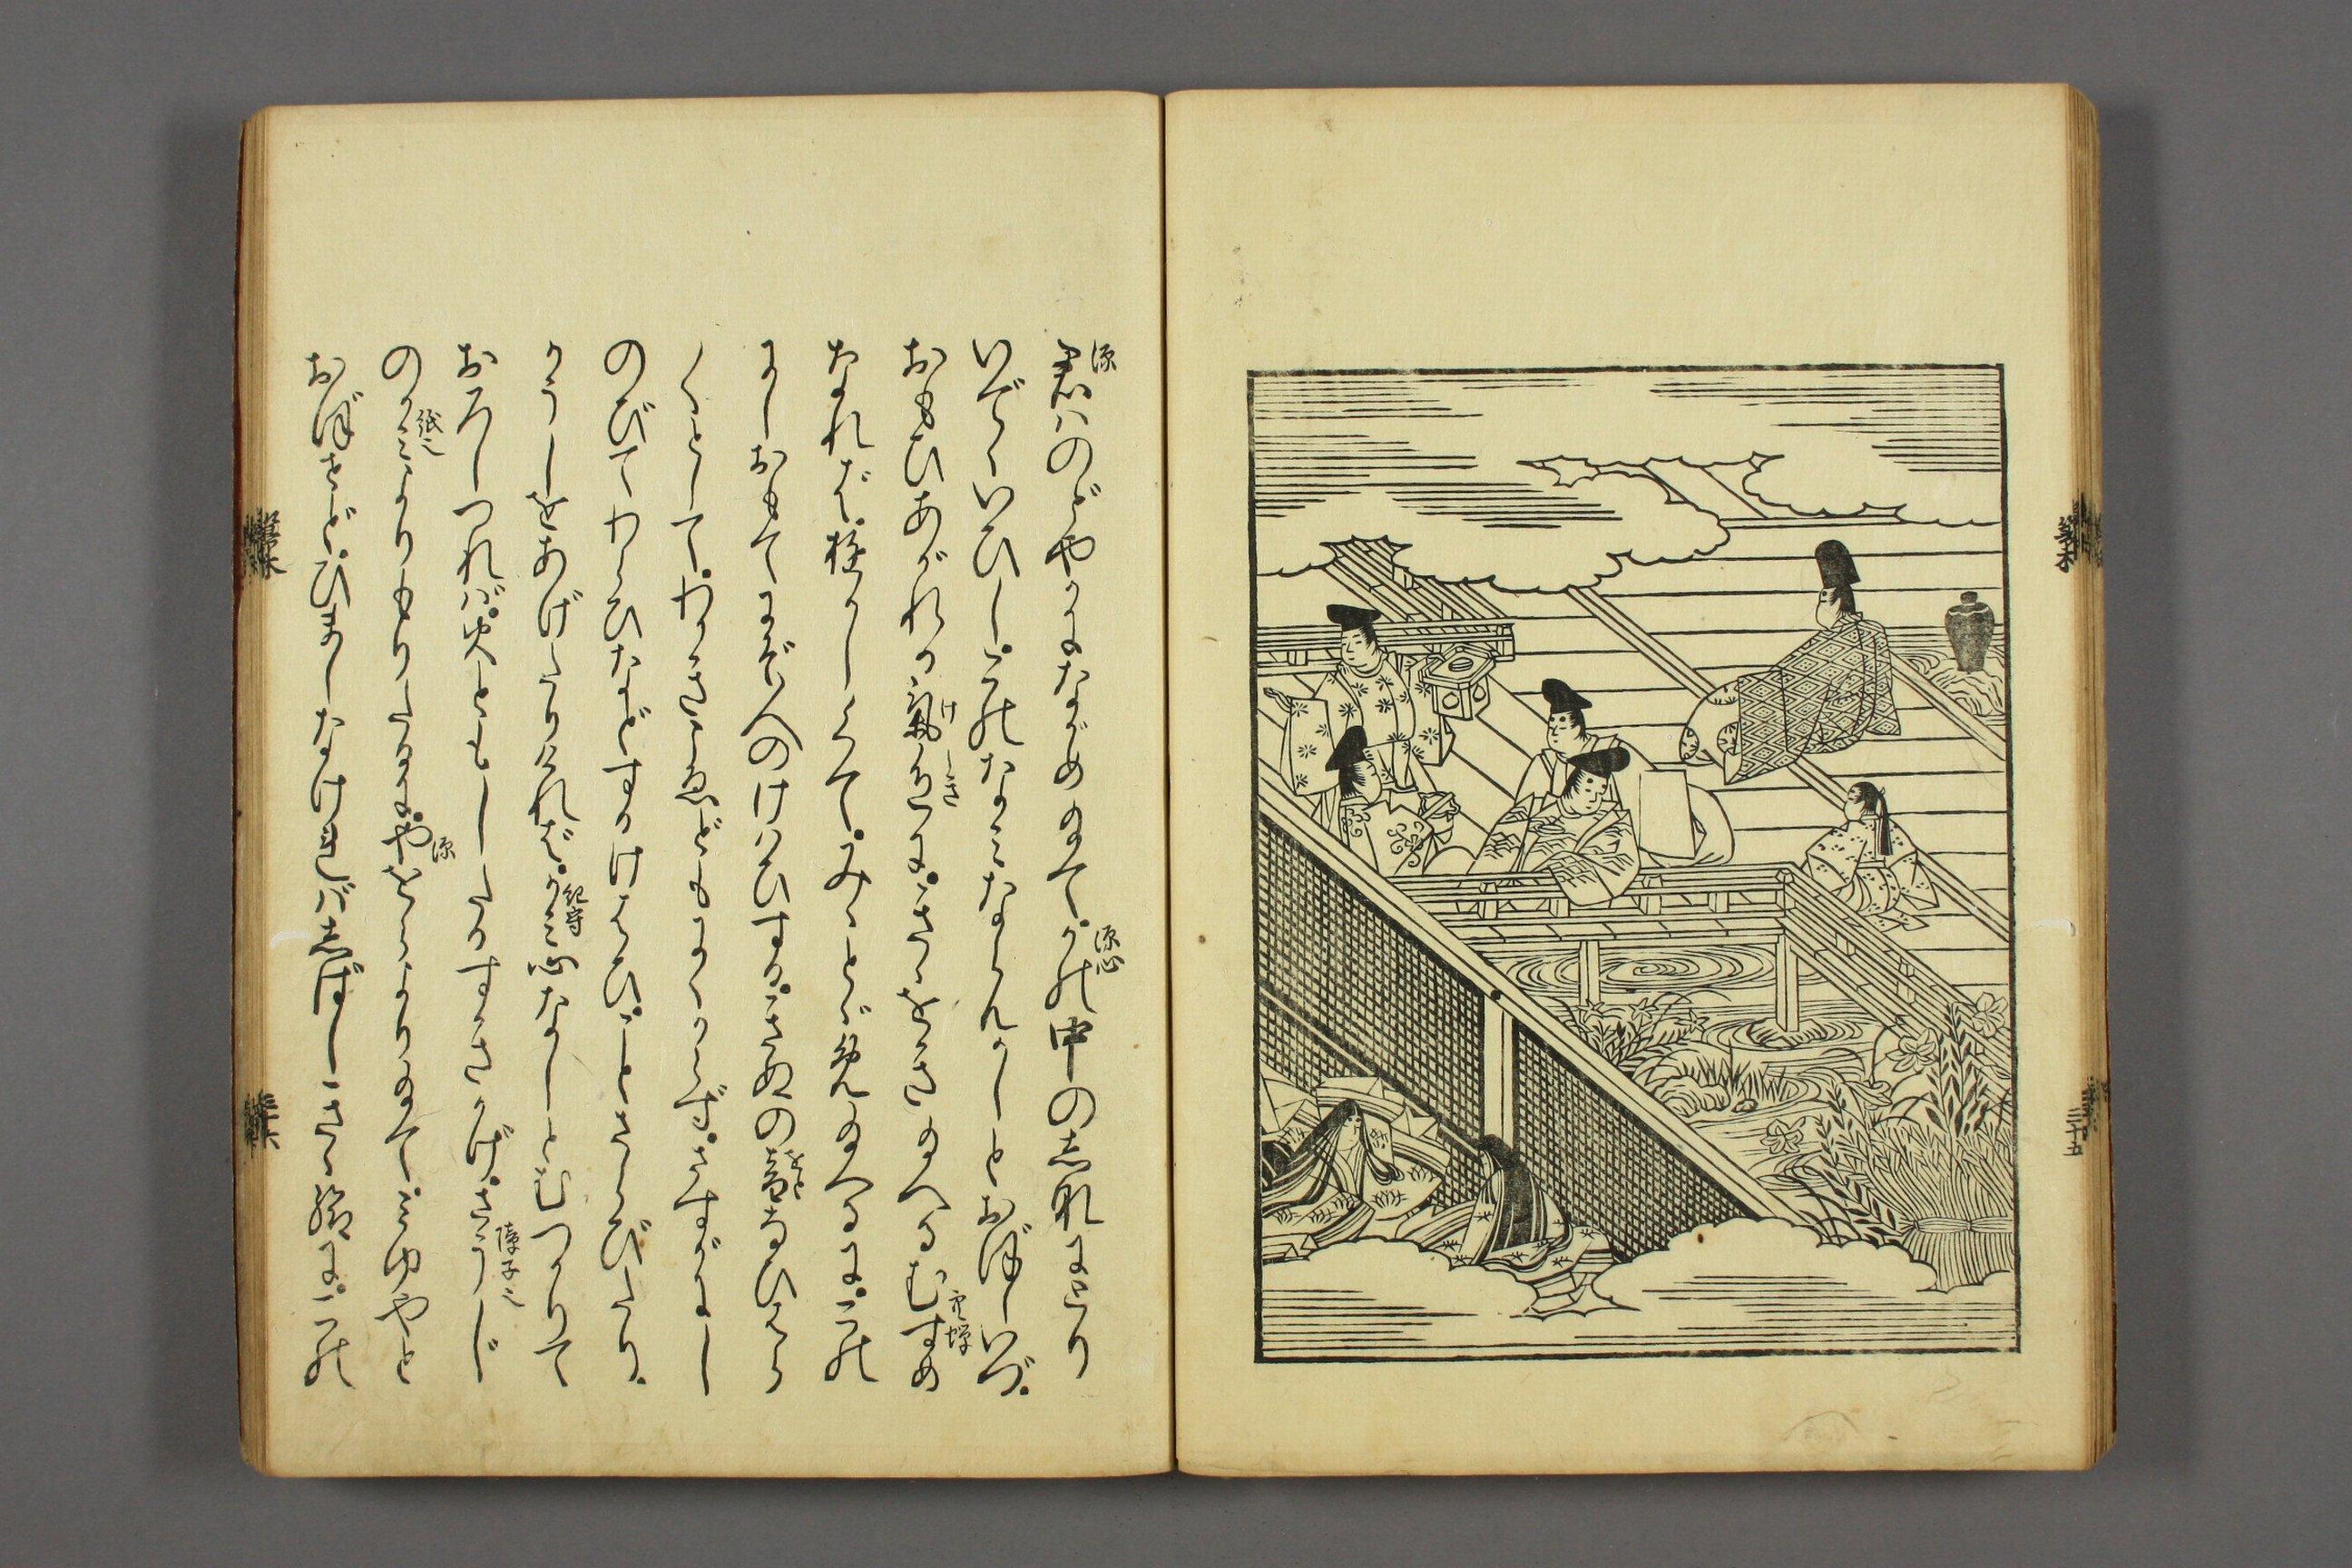 http://archive.wul.waseda.ac.jp/kosho/bunko30/bunko30_a0007/bunko30_a0007_0002/bunko30_a0007_0002_p0037.jpg